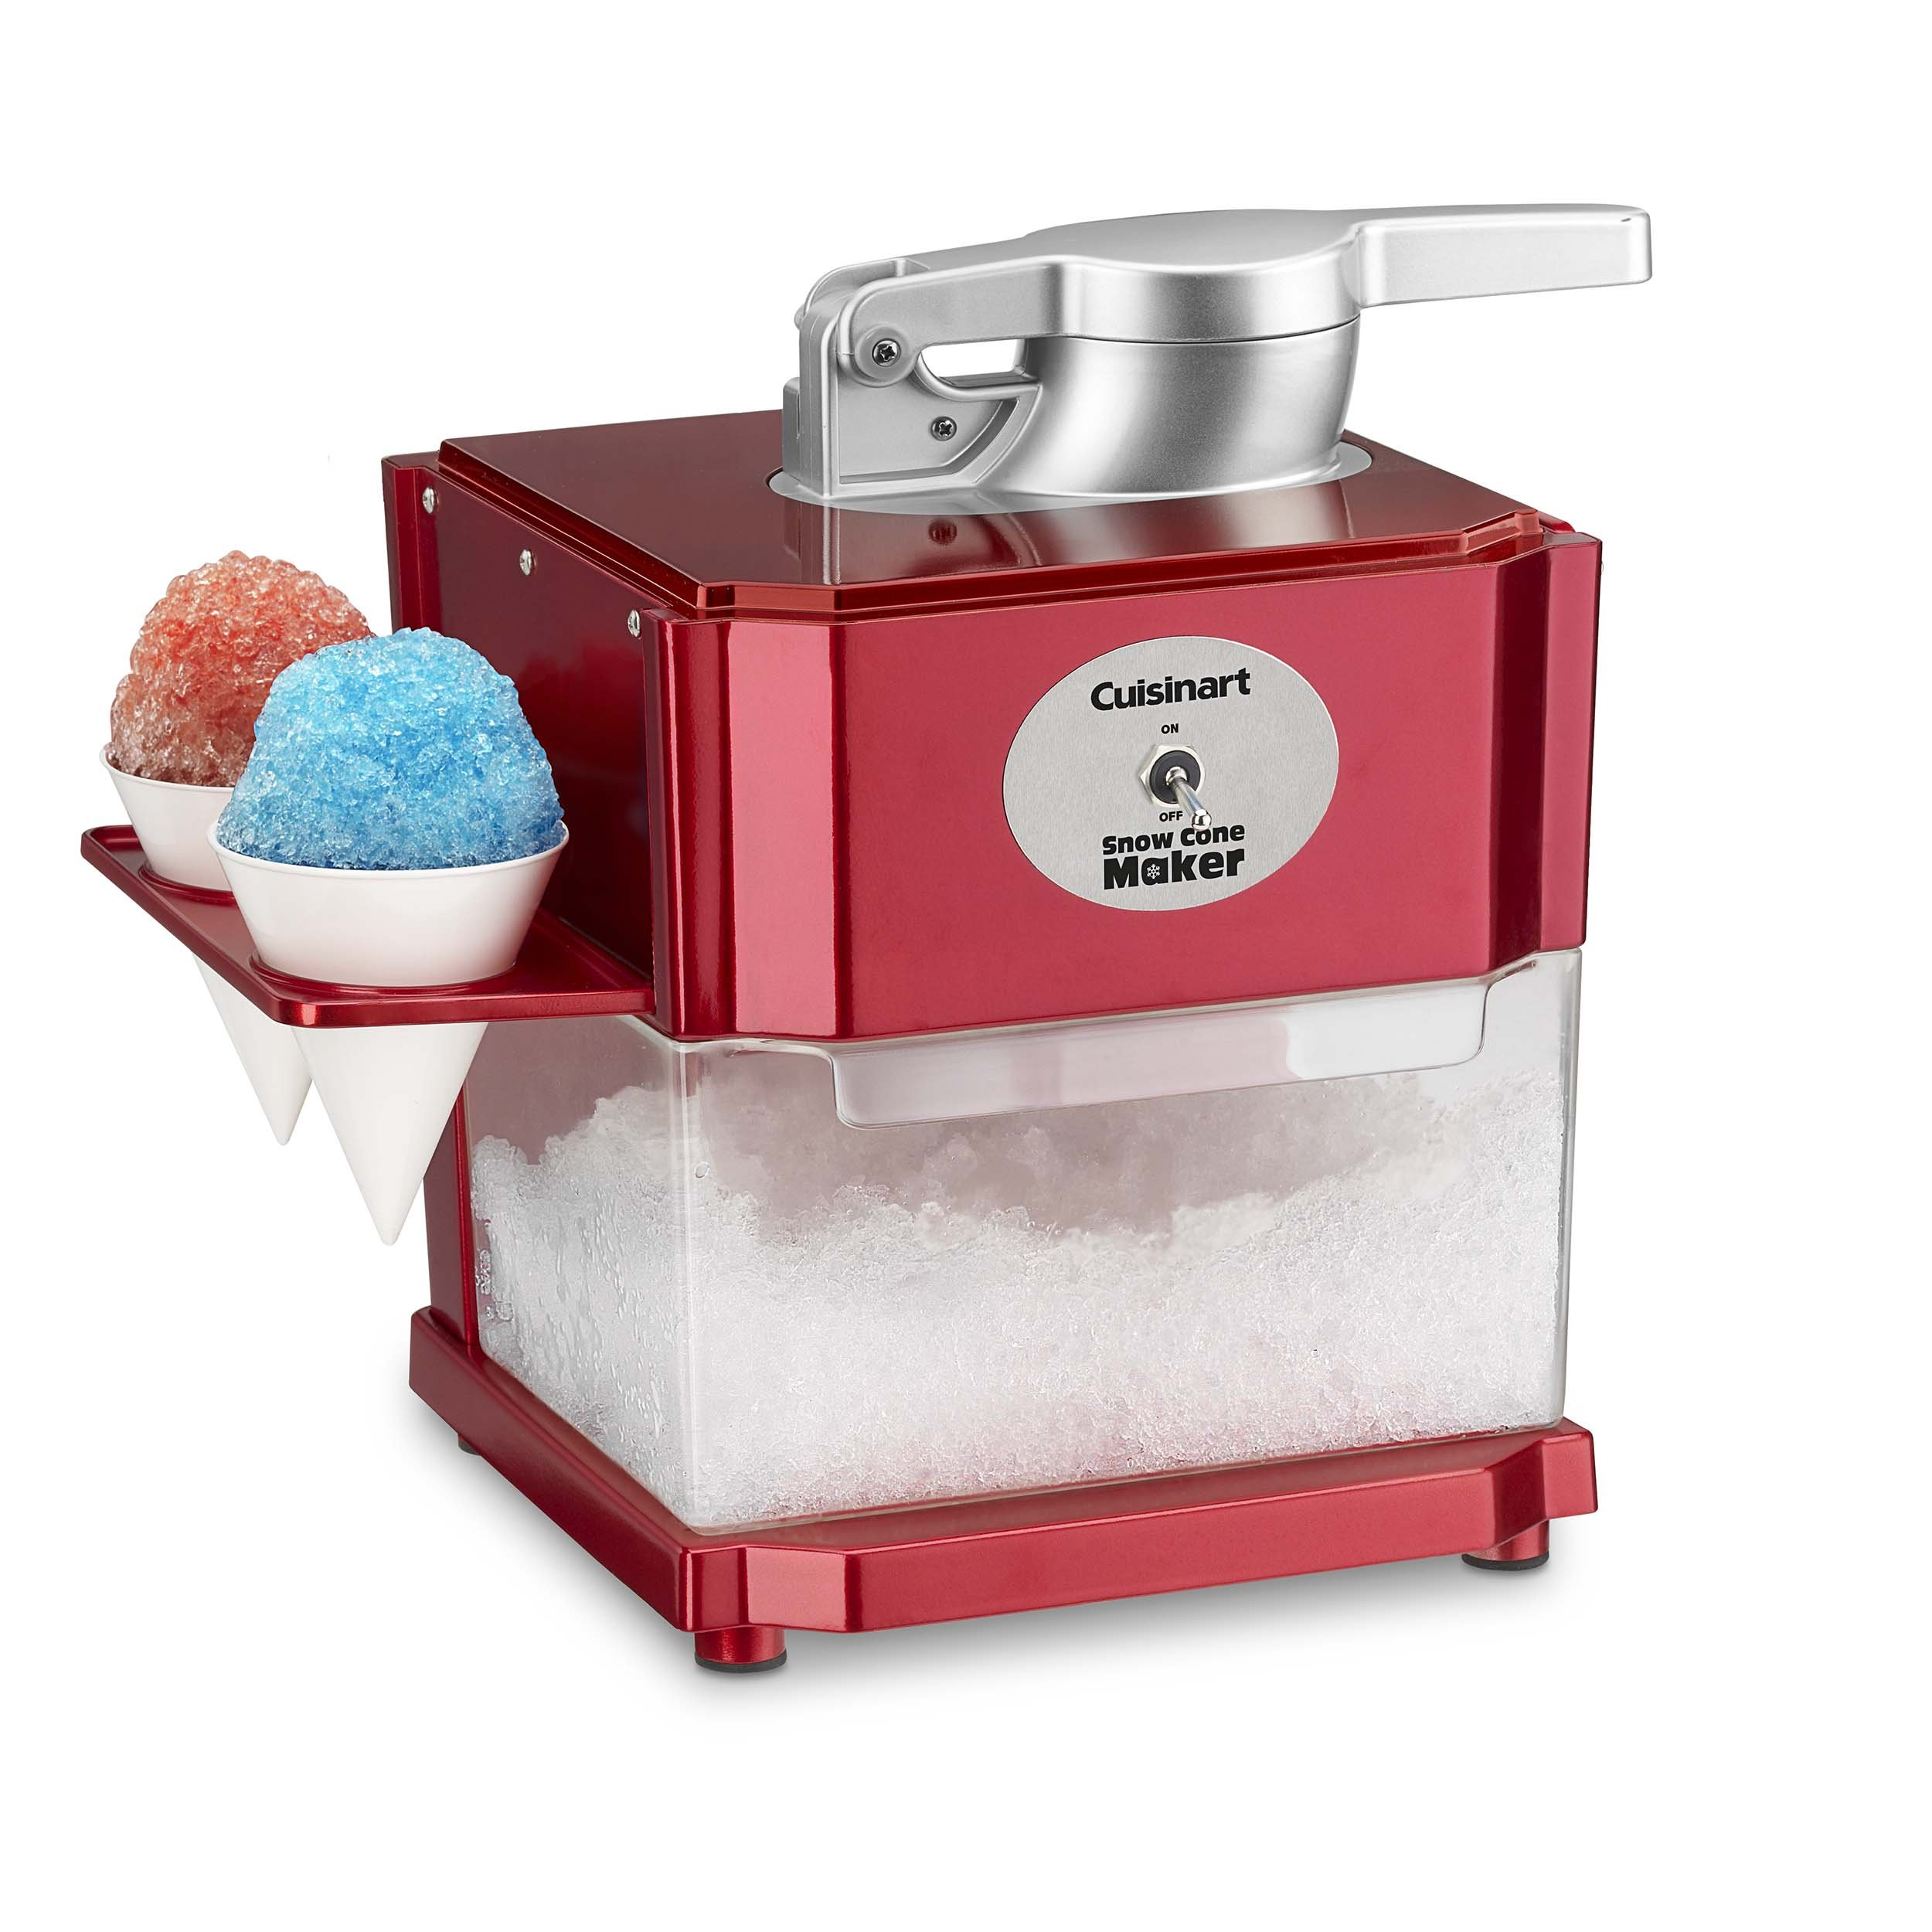 Cuisinart SCM 10 Snow Cone Maker